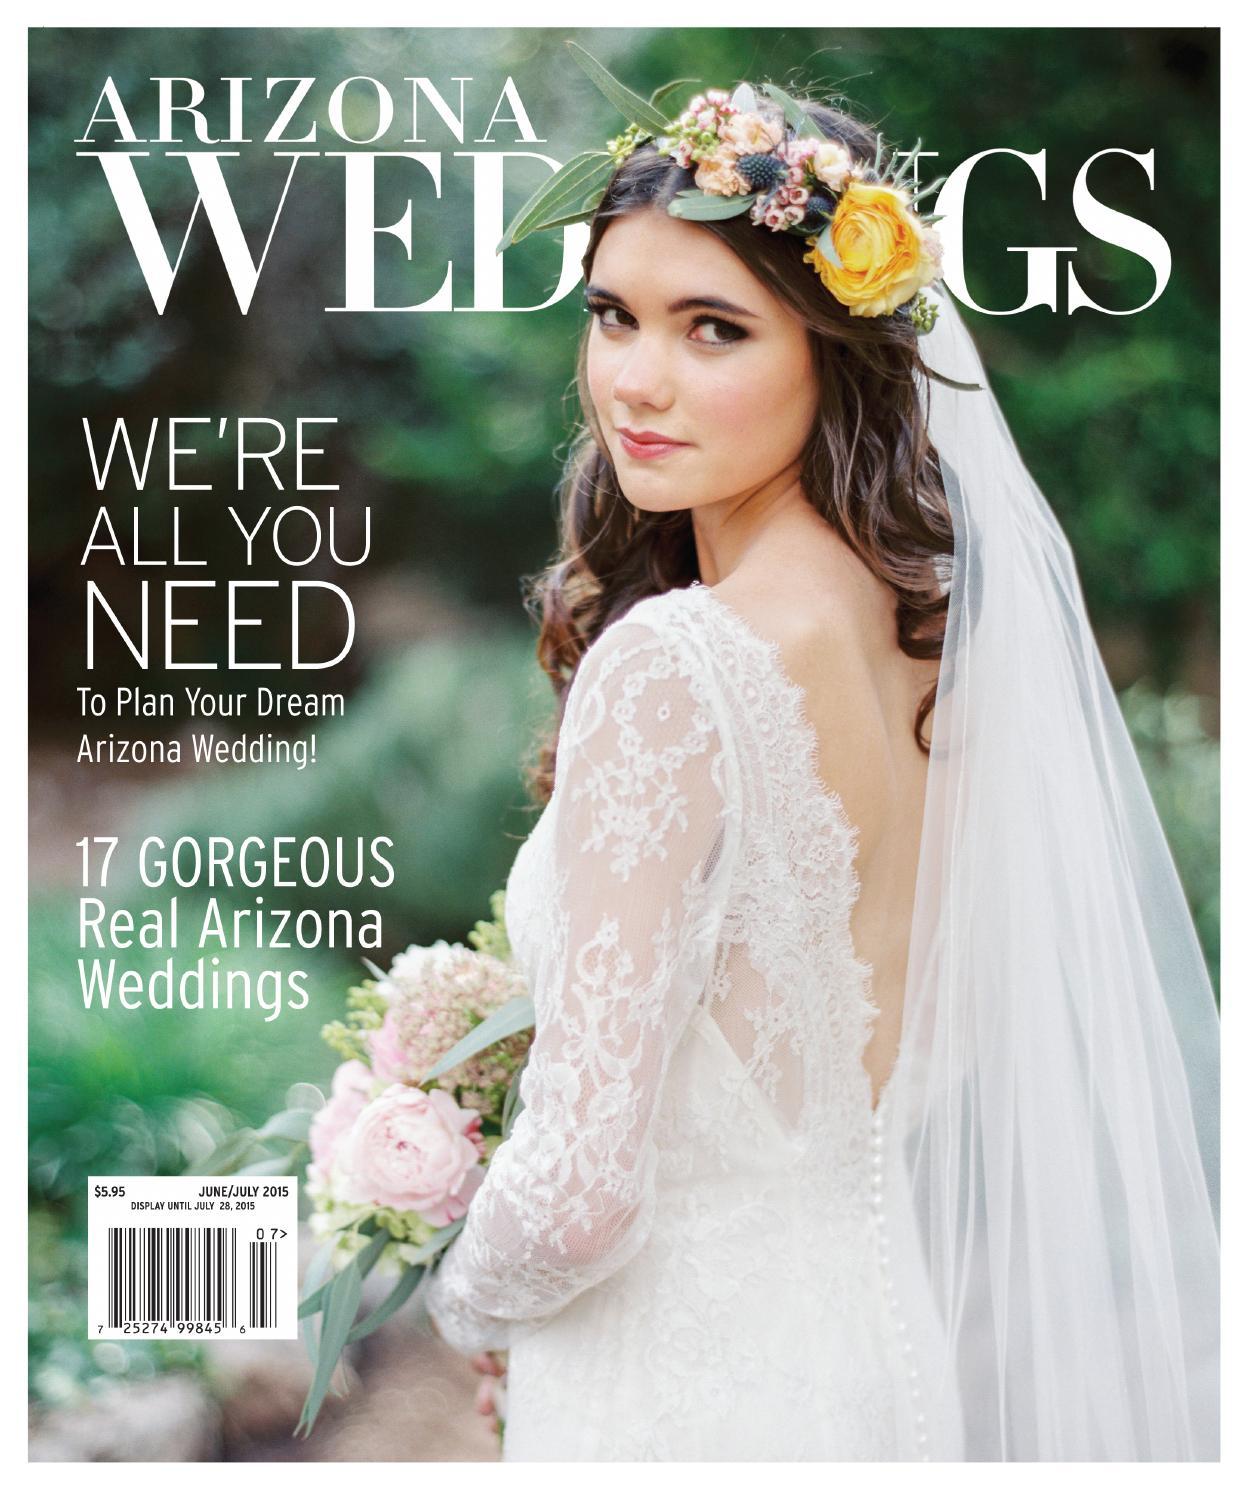 Arizona Weddings by Arizona Weddings Magazine & Website - issuu